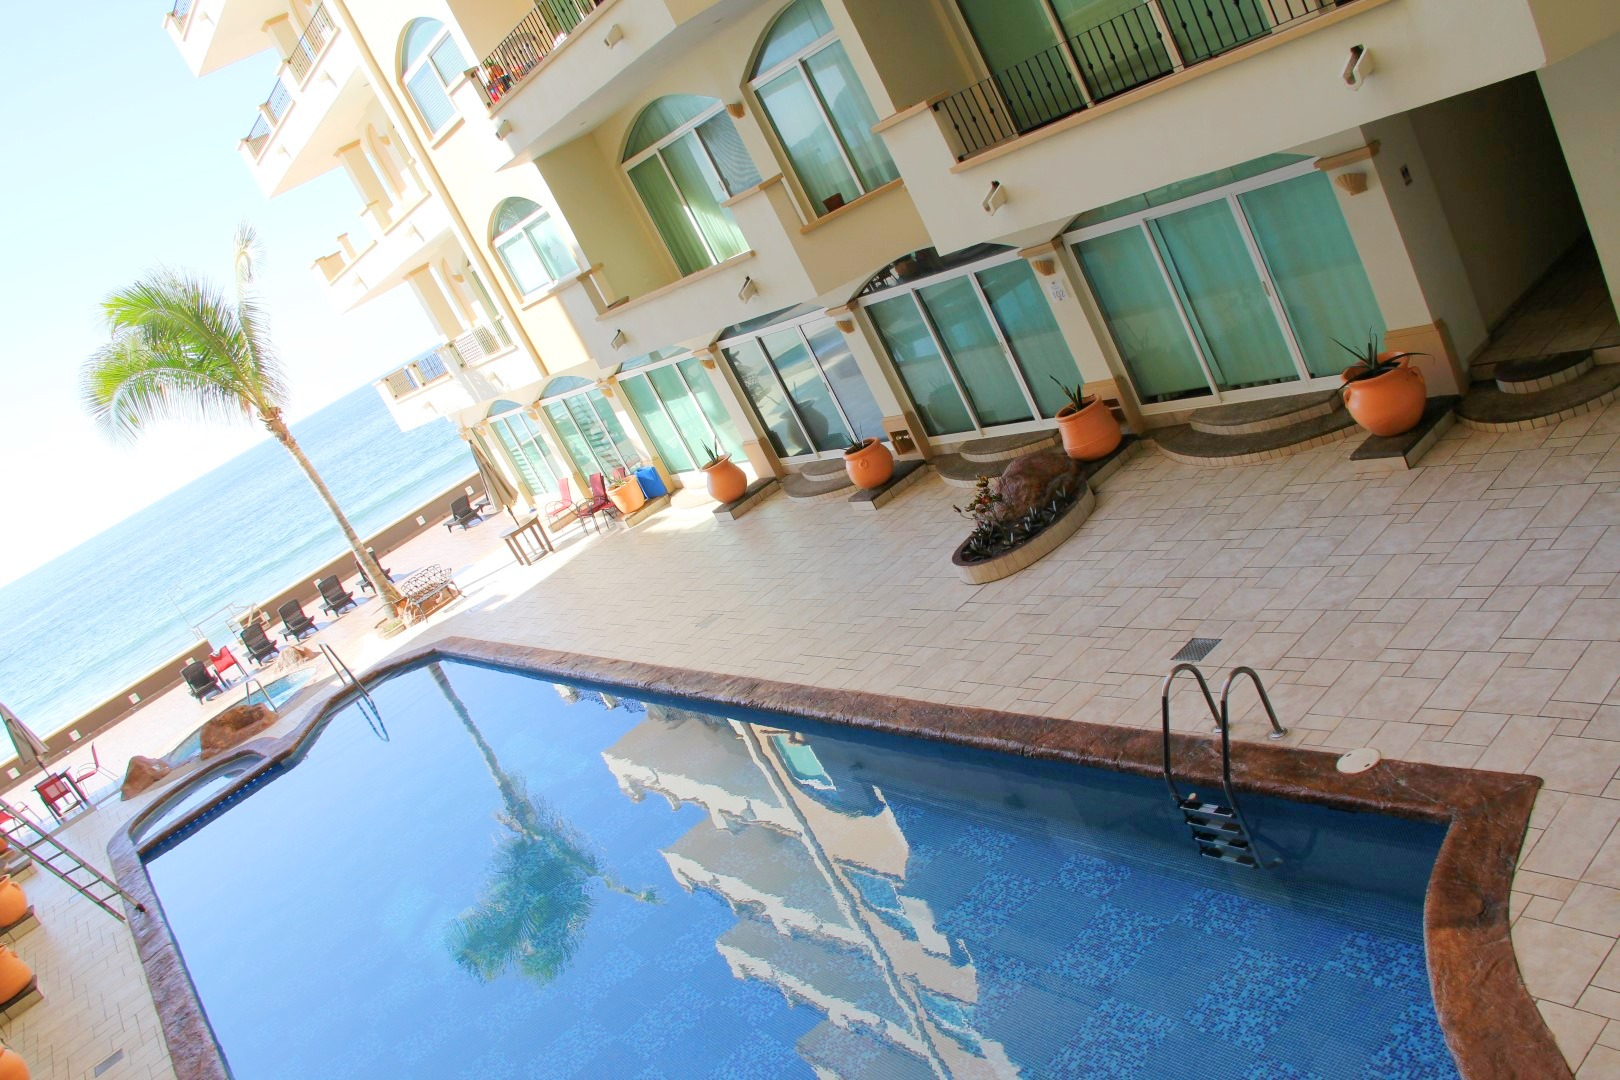 Pool and ocean views from Tiara Sands 208